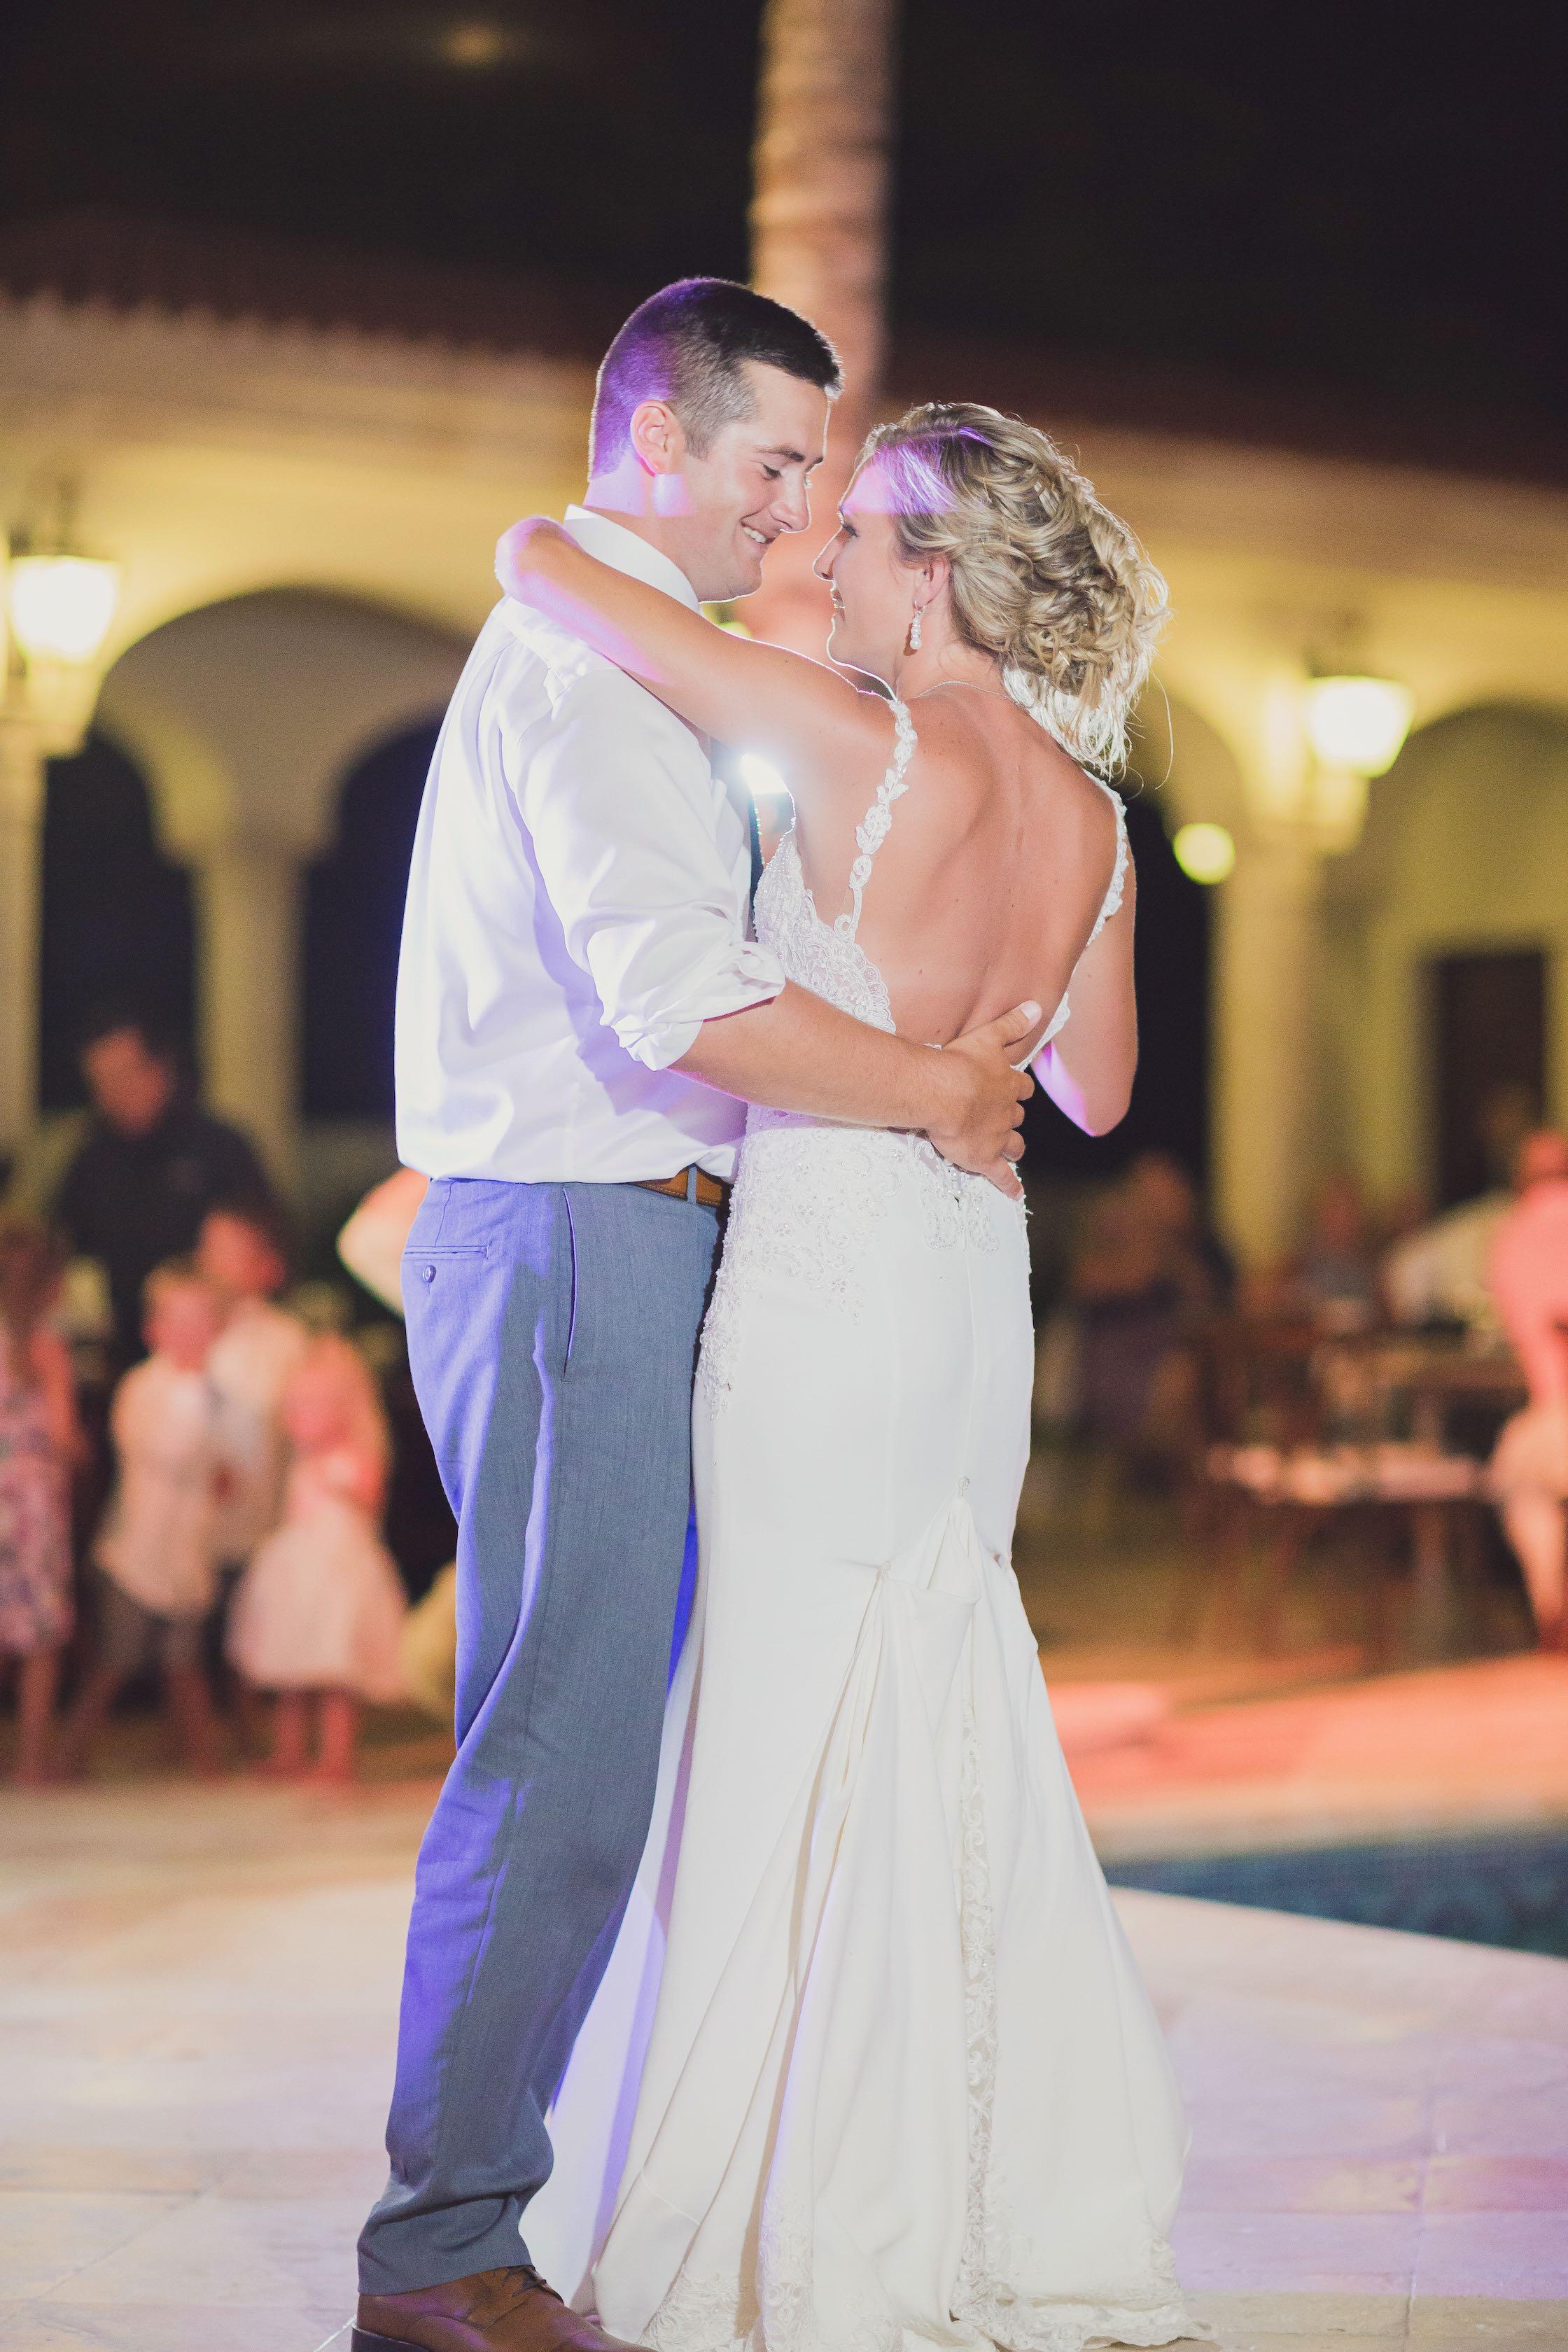 cancun-wedding-venue-villa-la-joya-972 copy-websize.jpg